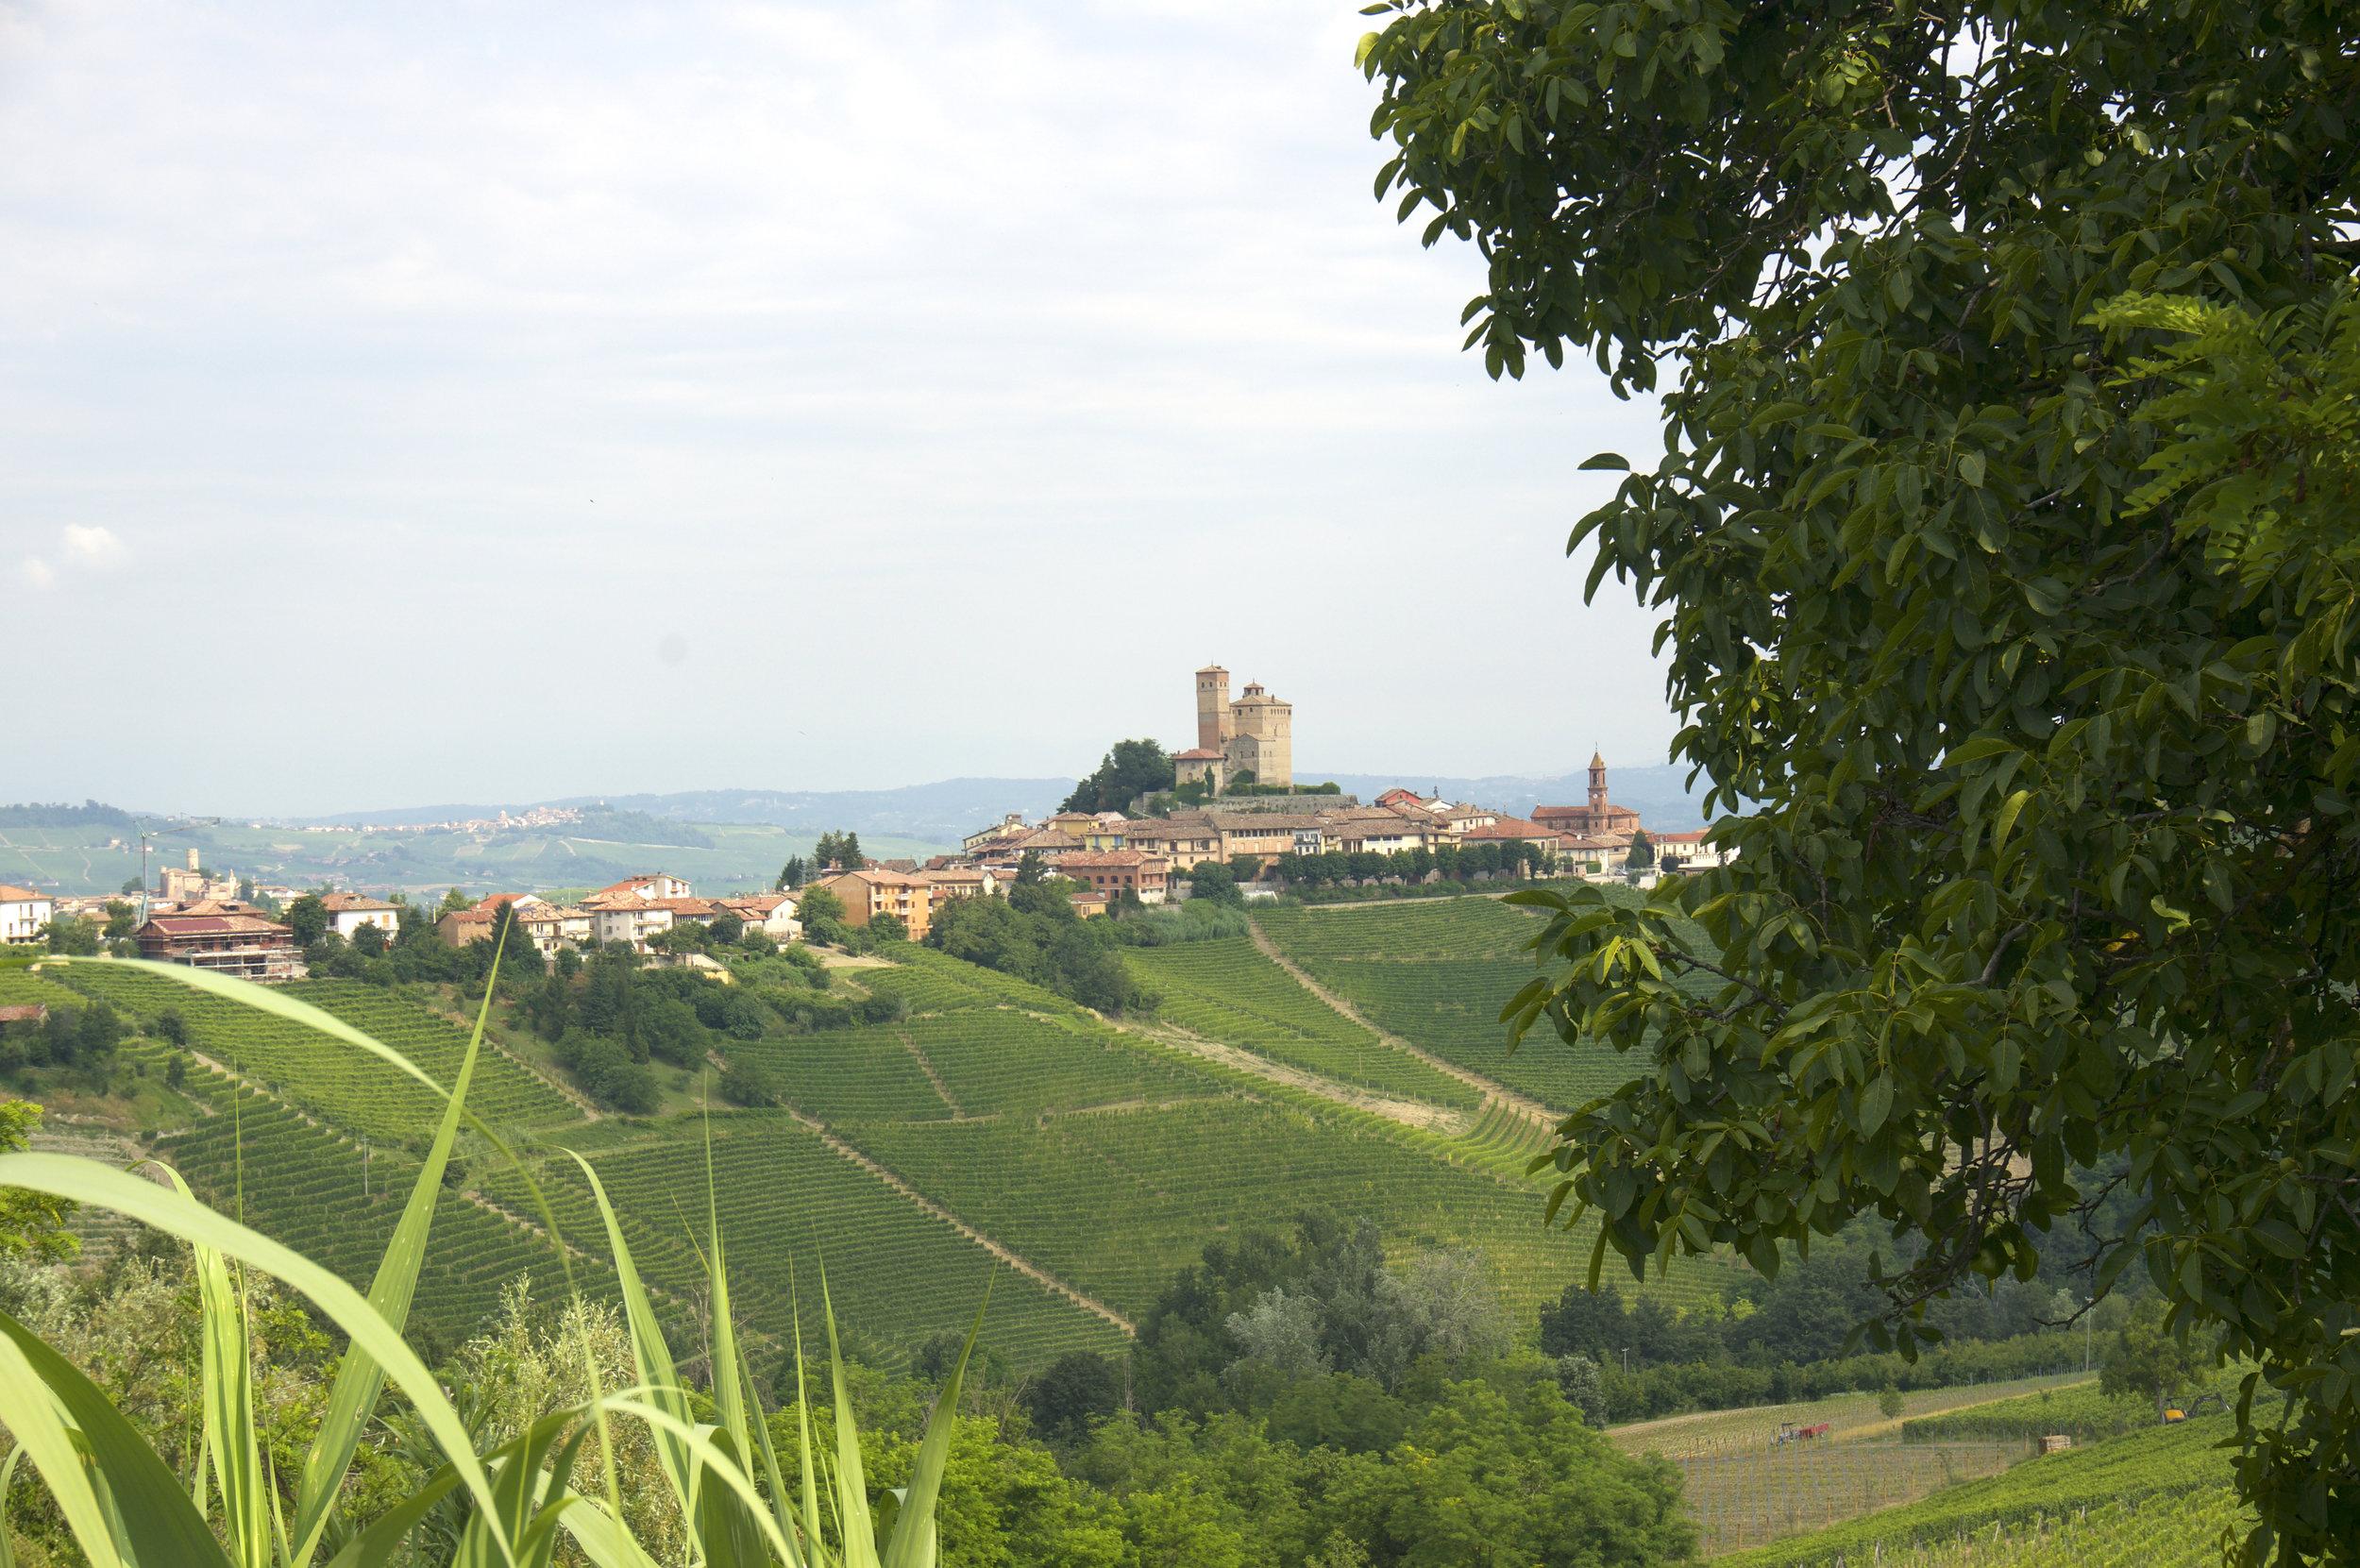 Serralunga d'Alba, Barolo, Italy.